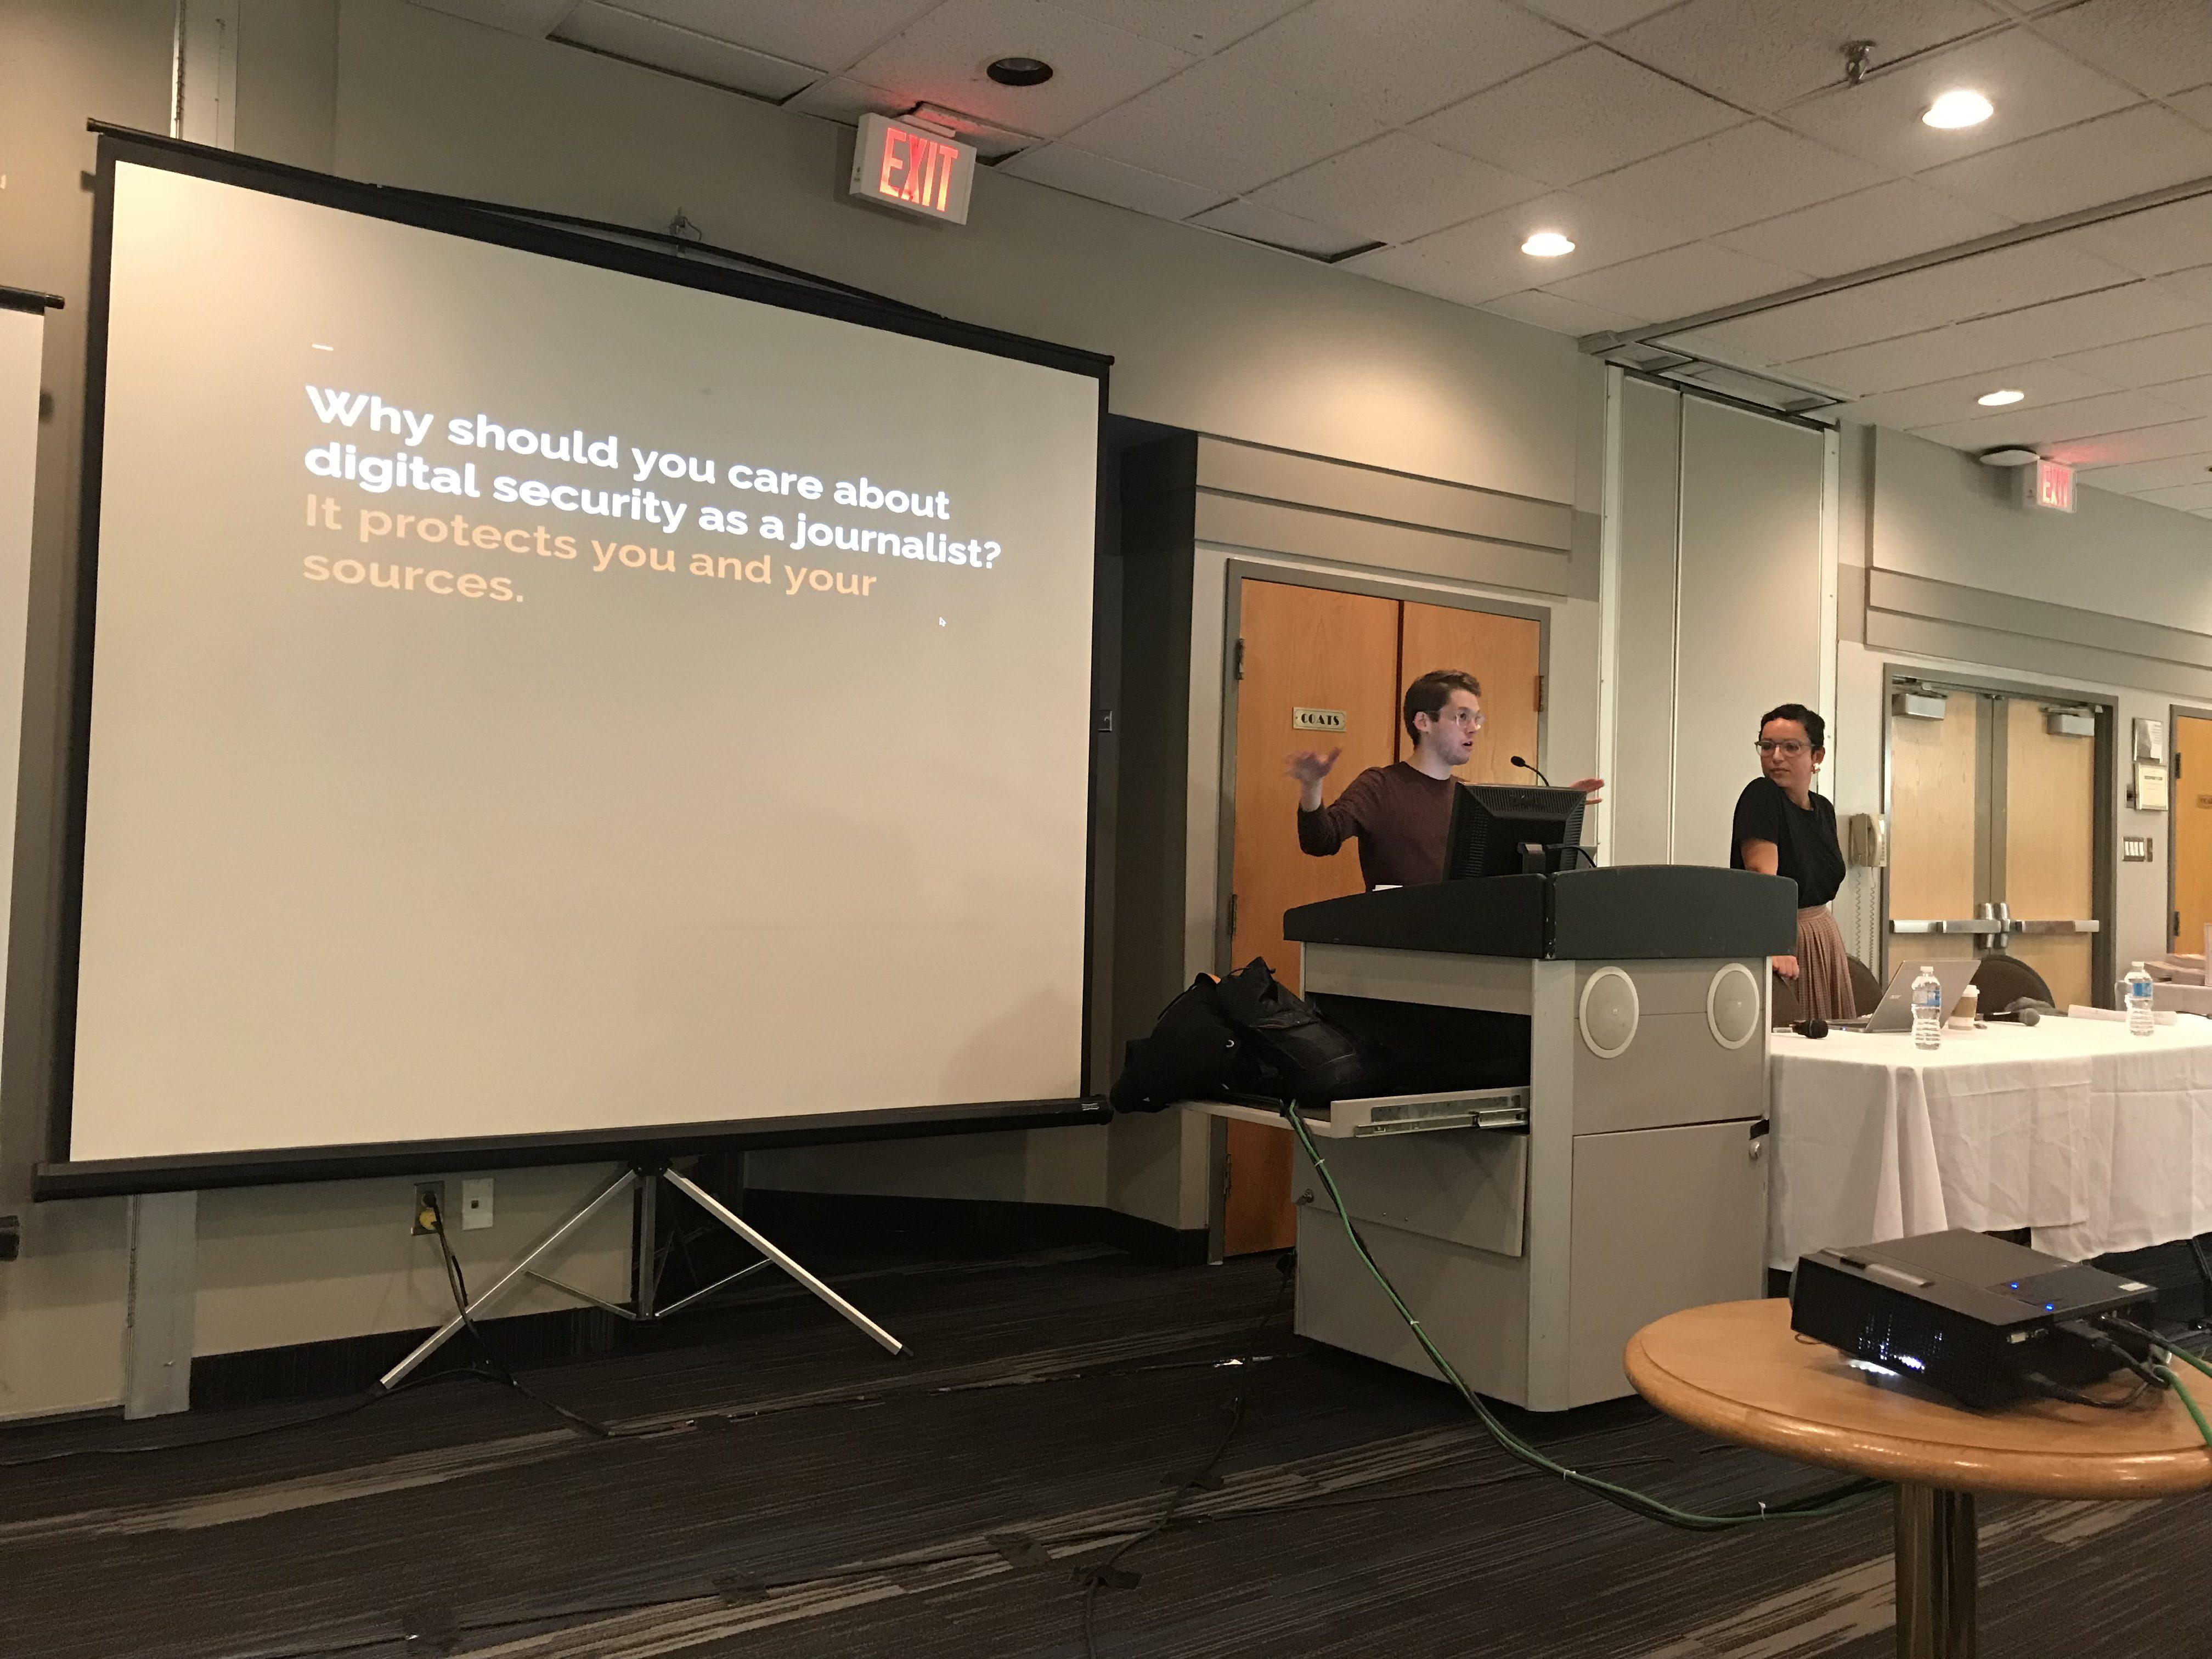 Matthew Braga and Susana Ferreira speak at Day of MediaToo on April 10, 2018. Sonny Sachdeva